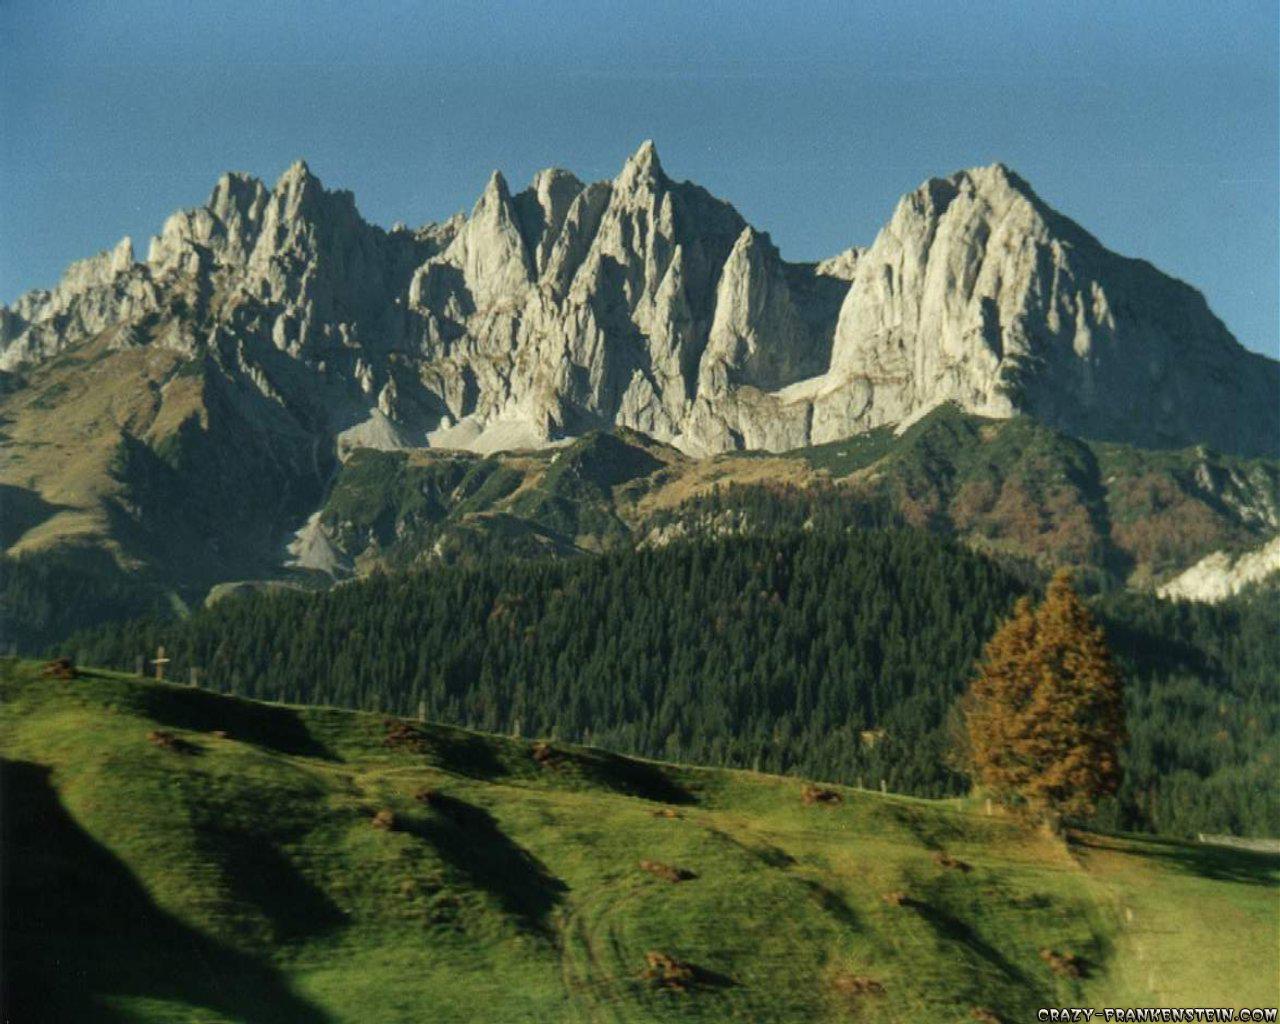 http://2.bp.blogspot.com/-s_ZgK-cxWws/TbxRrVzxV9I/AAAAAAAAADk/rG_6Zd0T-ec/s1600/landscape-wallpapers.jpg